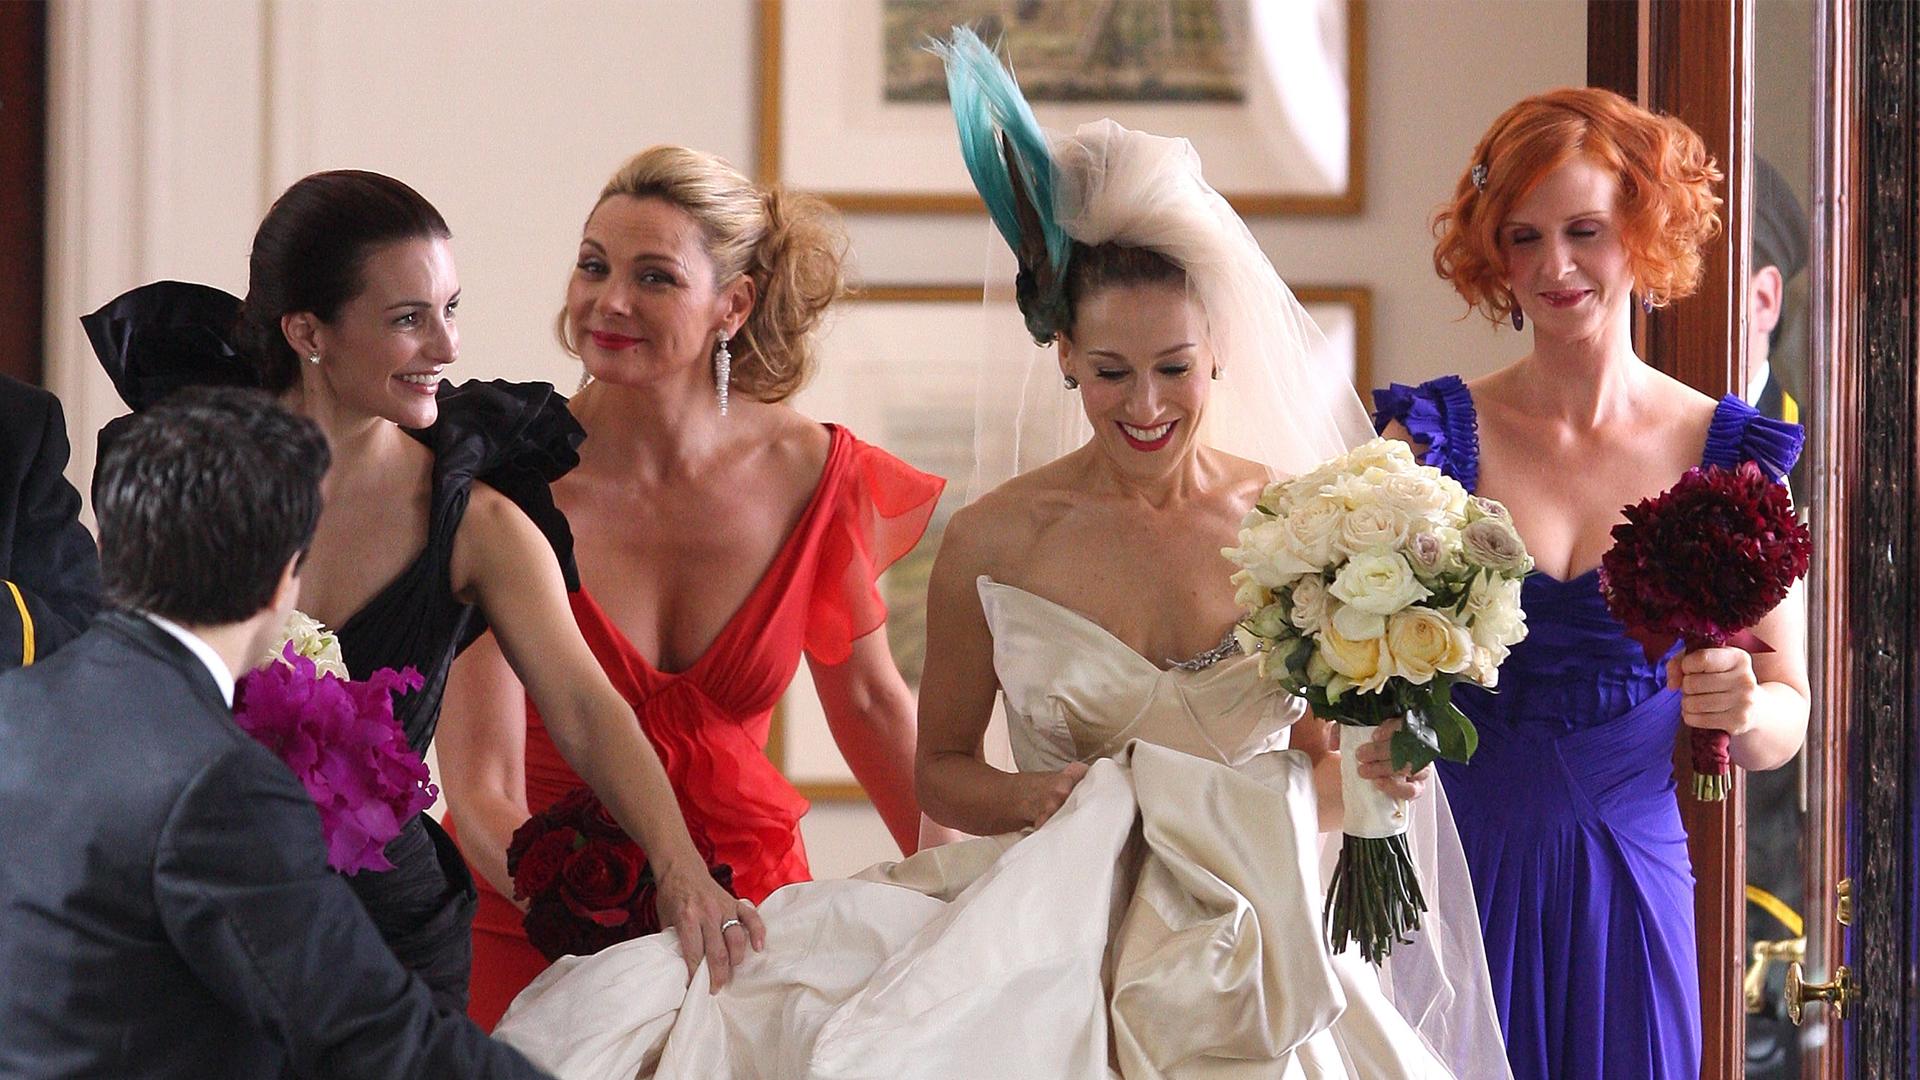 The 15 Most Memorable Weddings in Movie History